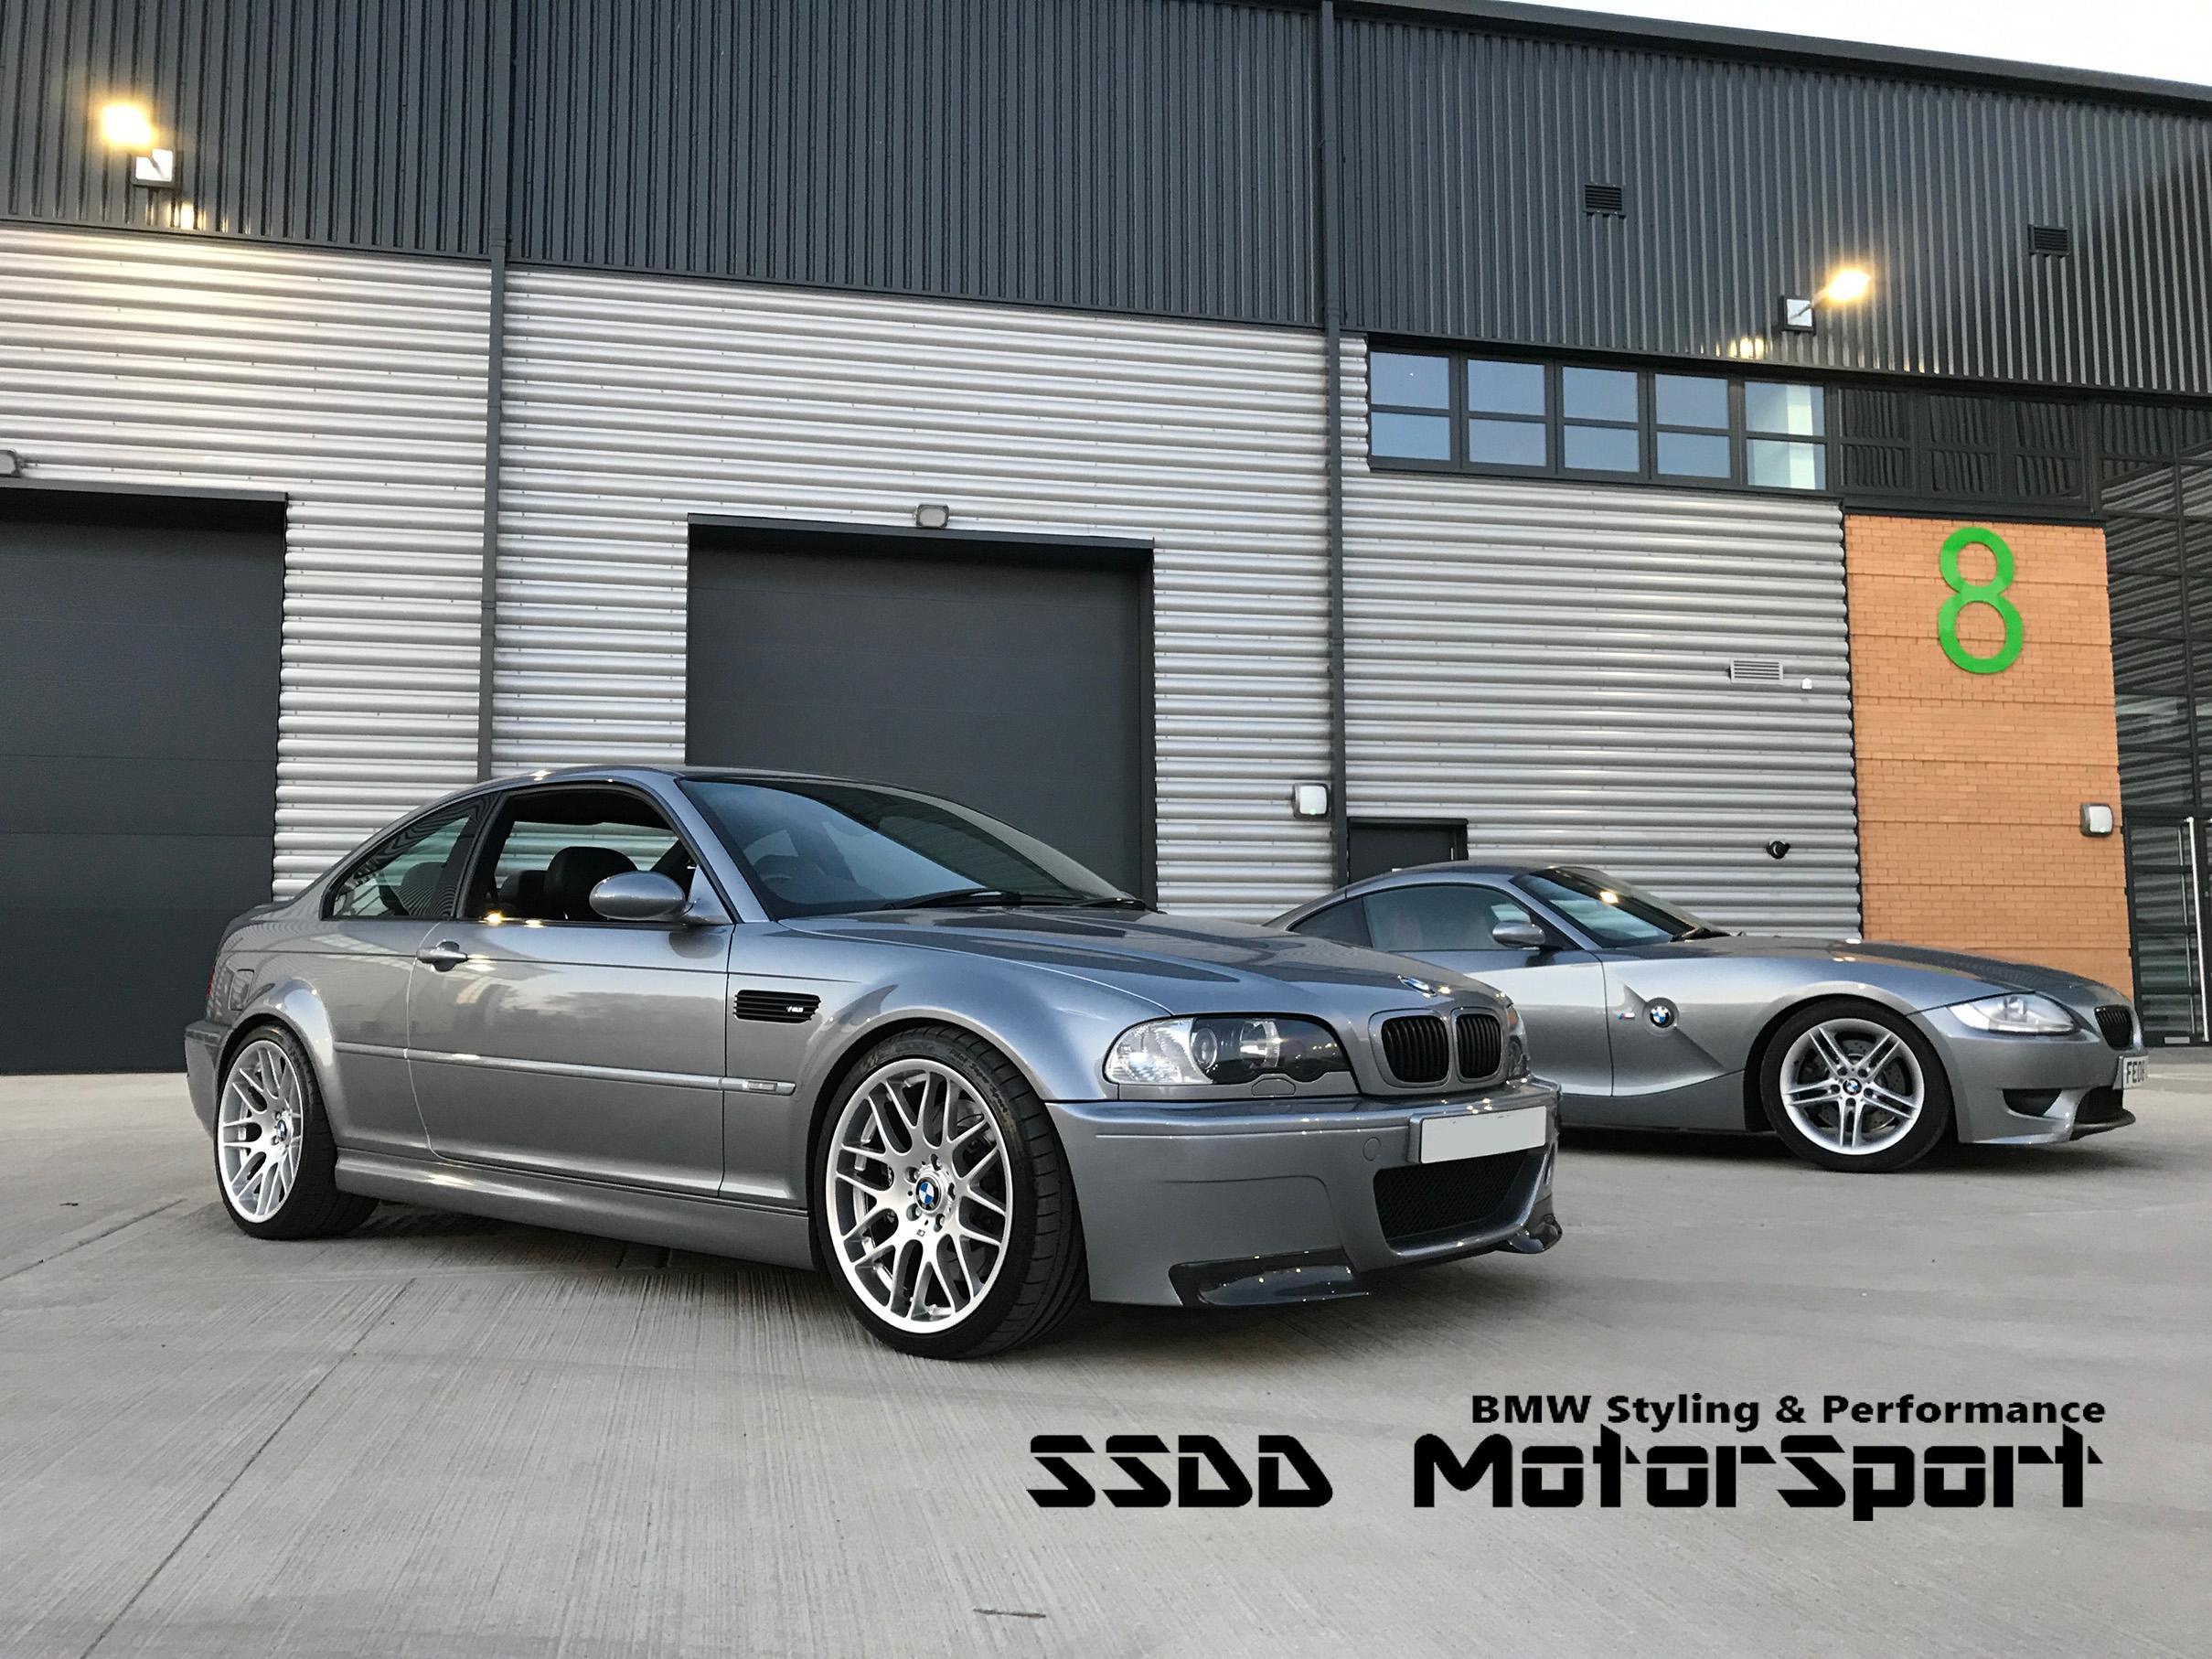 bmw-e46-m3-csl-bumper-ssdd-motorsport-10.jpg